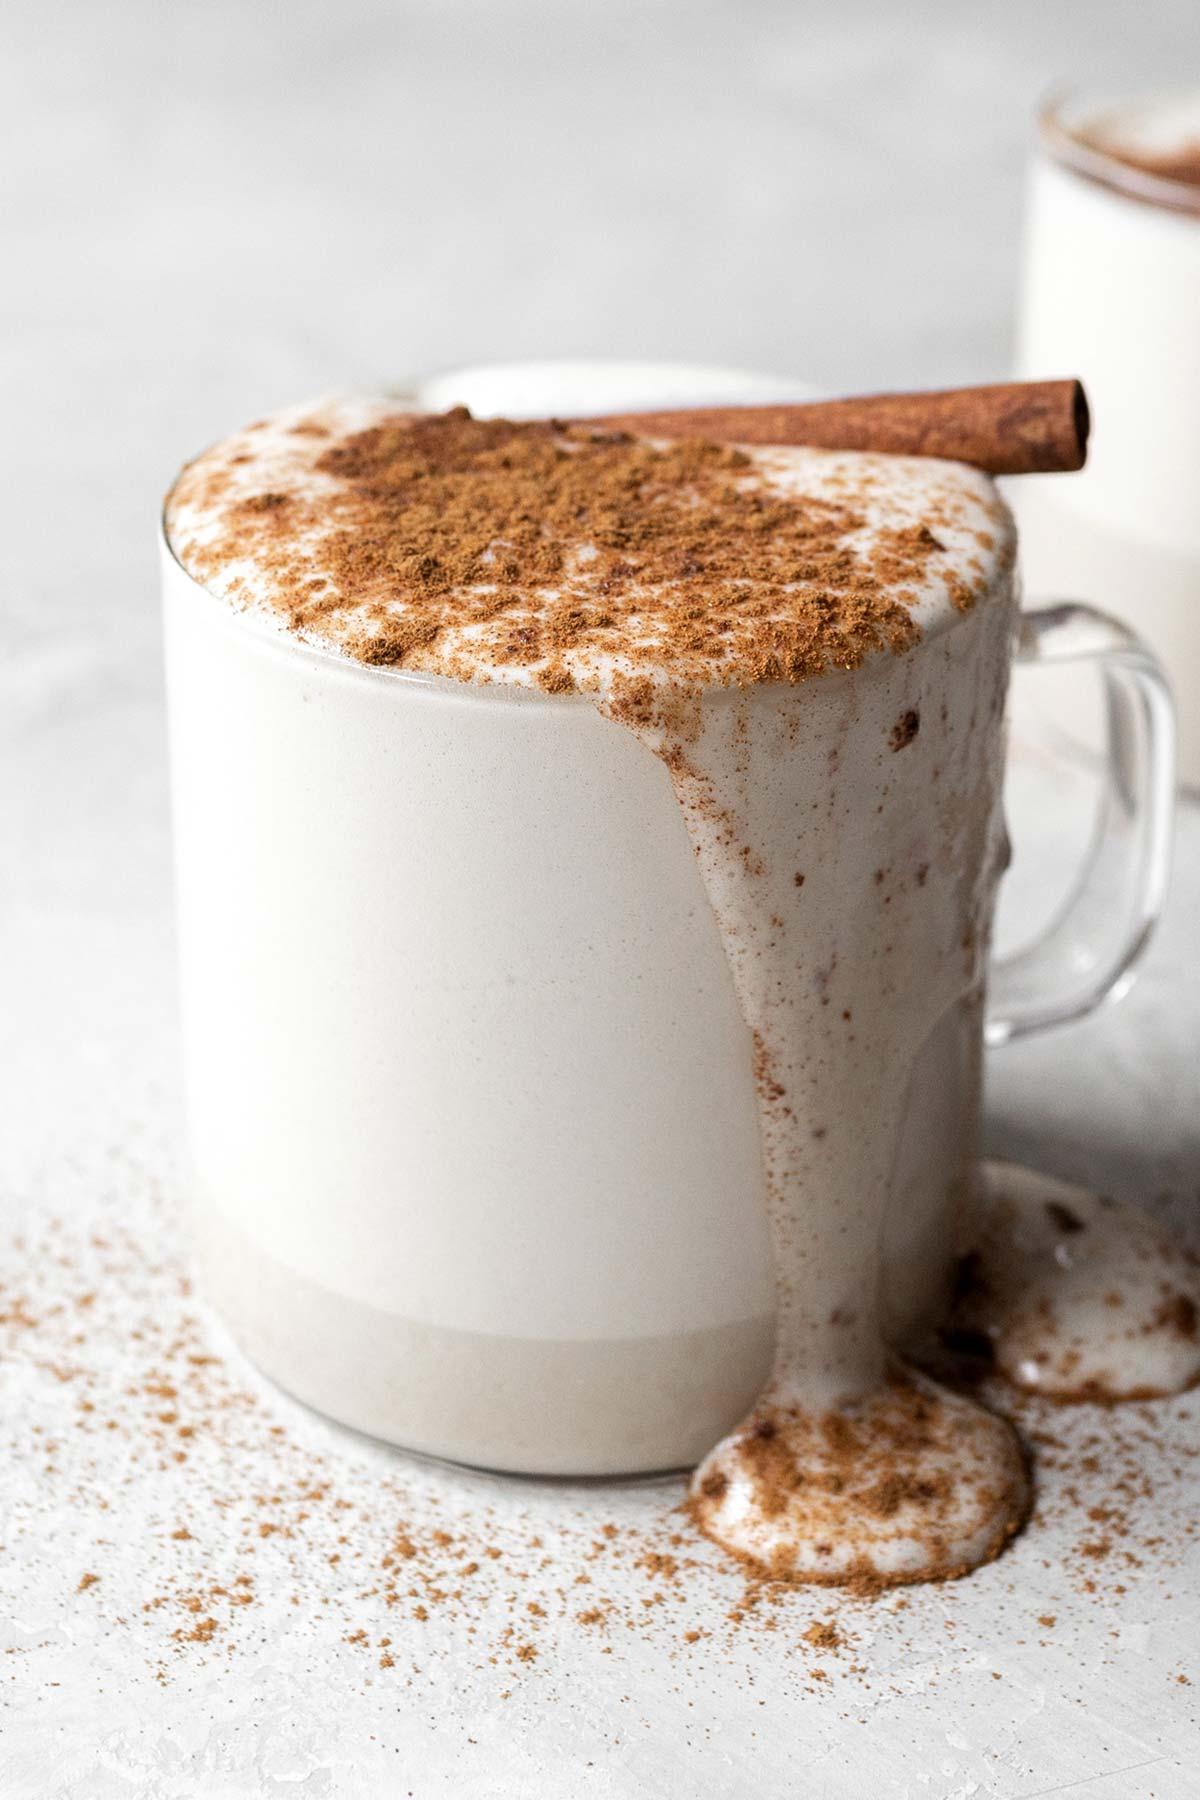 Chamomile tea latte garnished with ground cinnamon and a cinnamon stick in a glass mug.